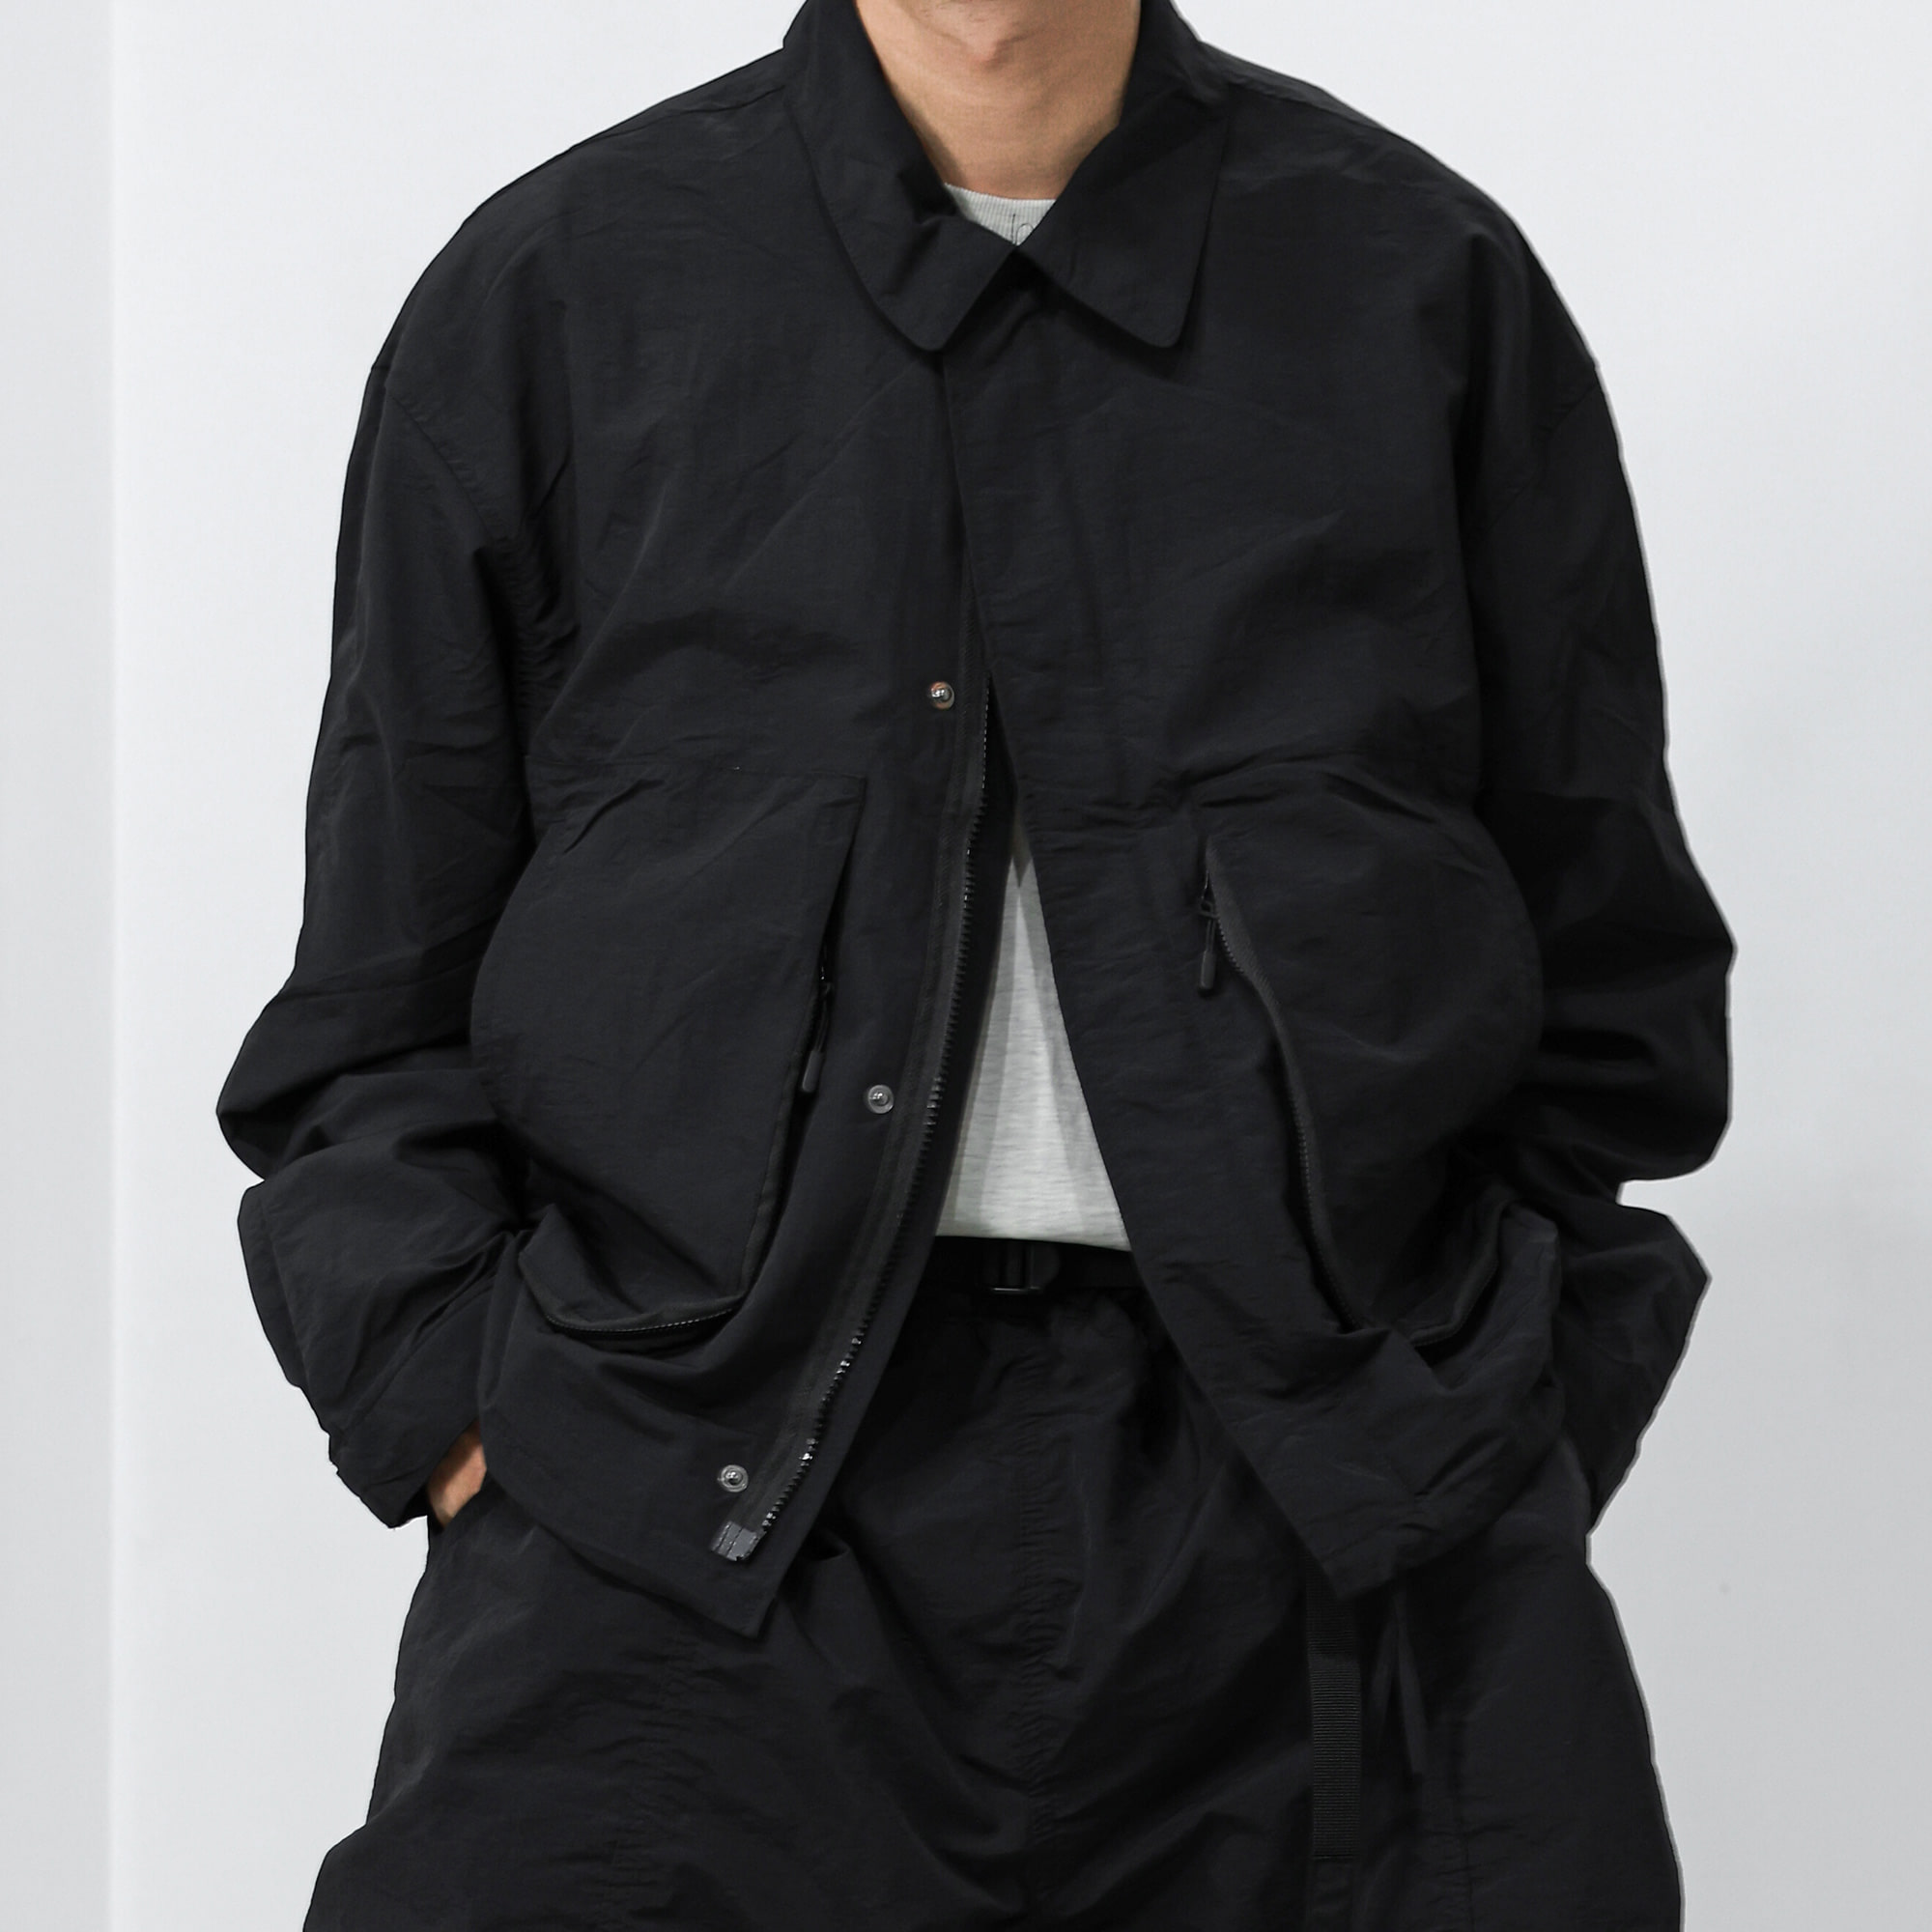 Two-way Solid Pocket Nylon Jacket - Black